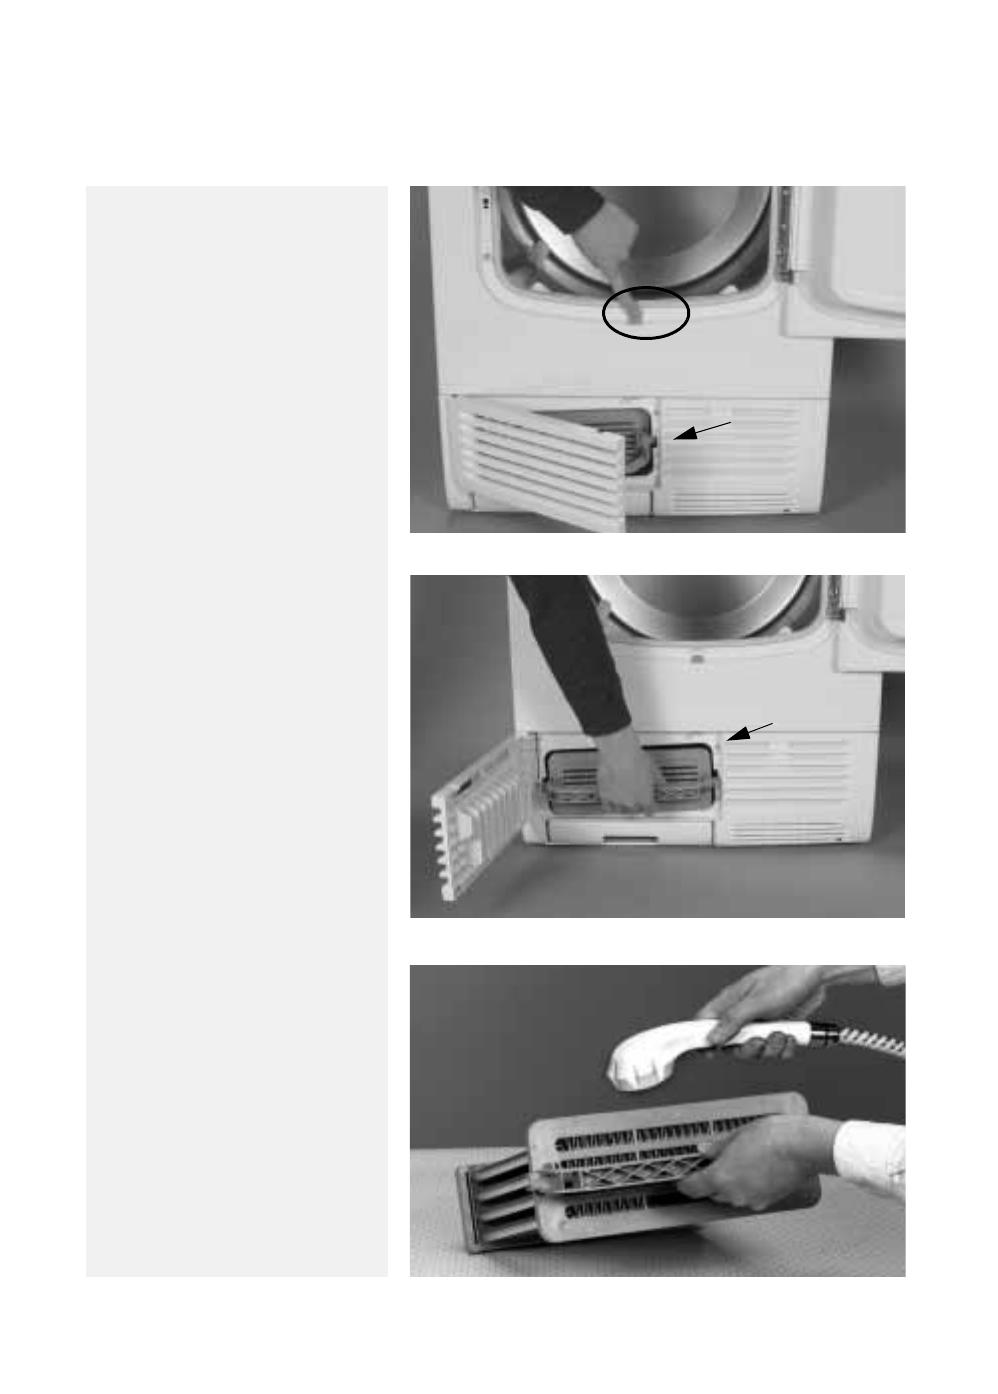 handleiding whirlpool senseline c 6th awz 9600 pagina 7. Black Bedroom Furniture Sets. Home Design Ideas